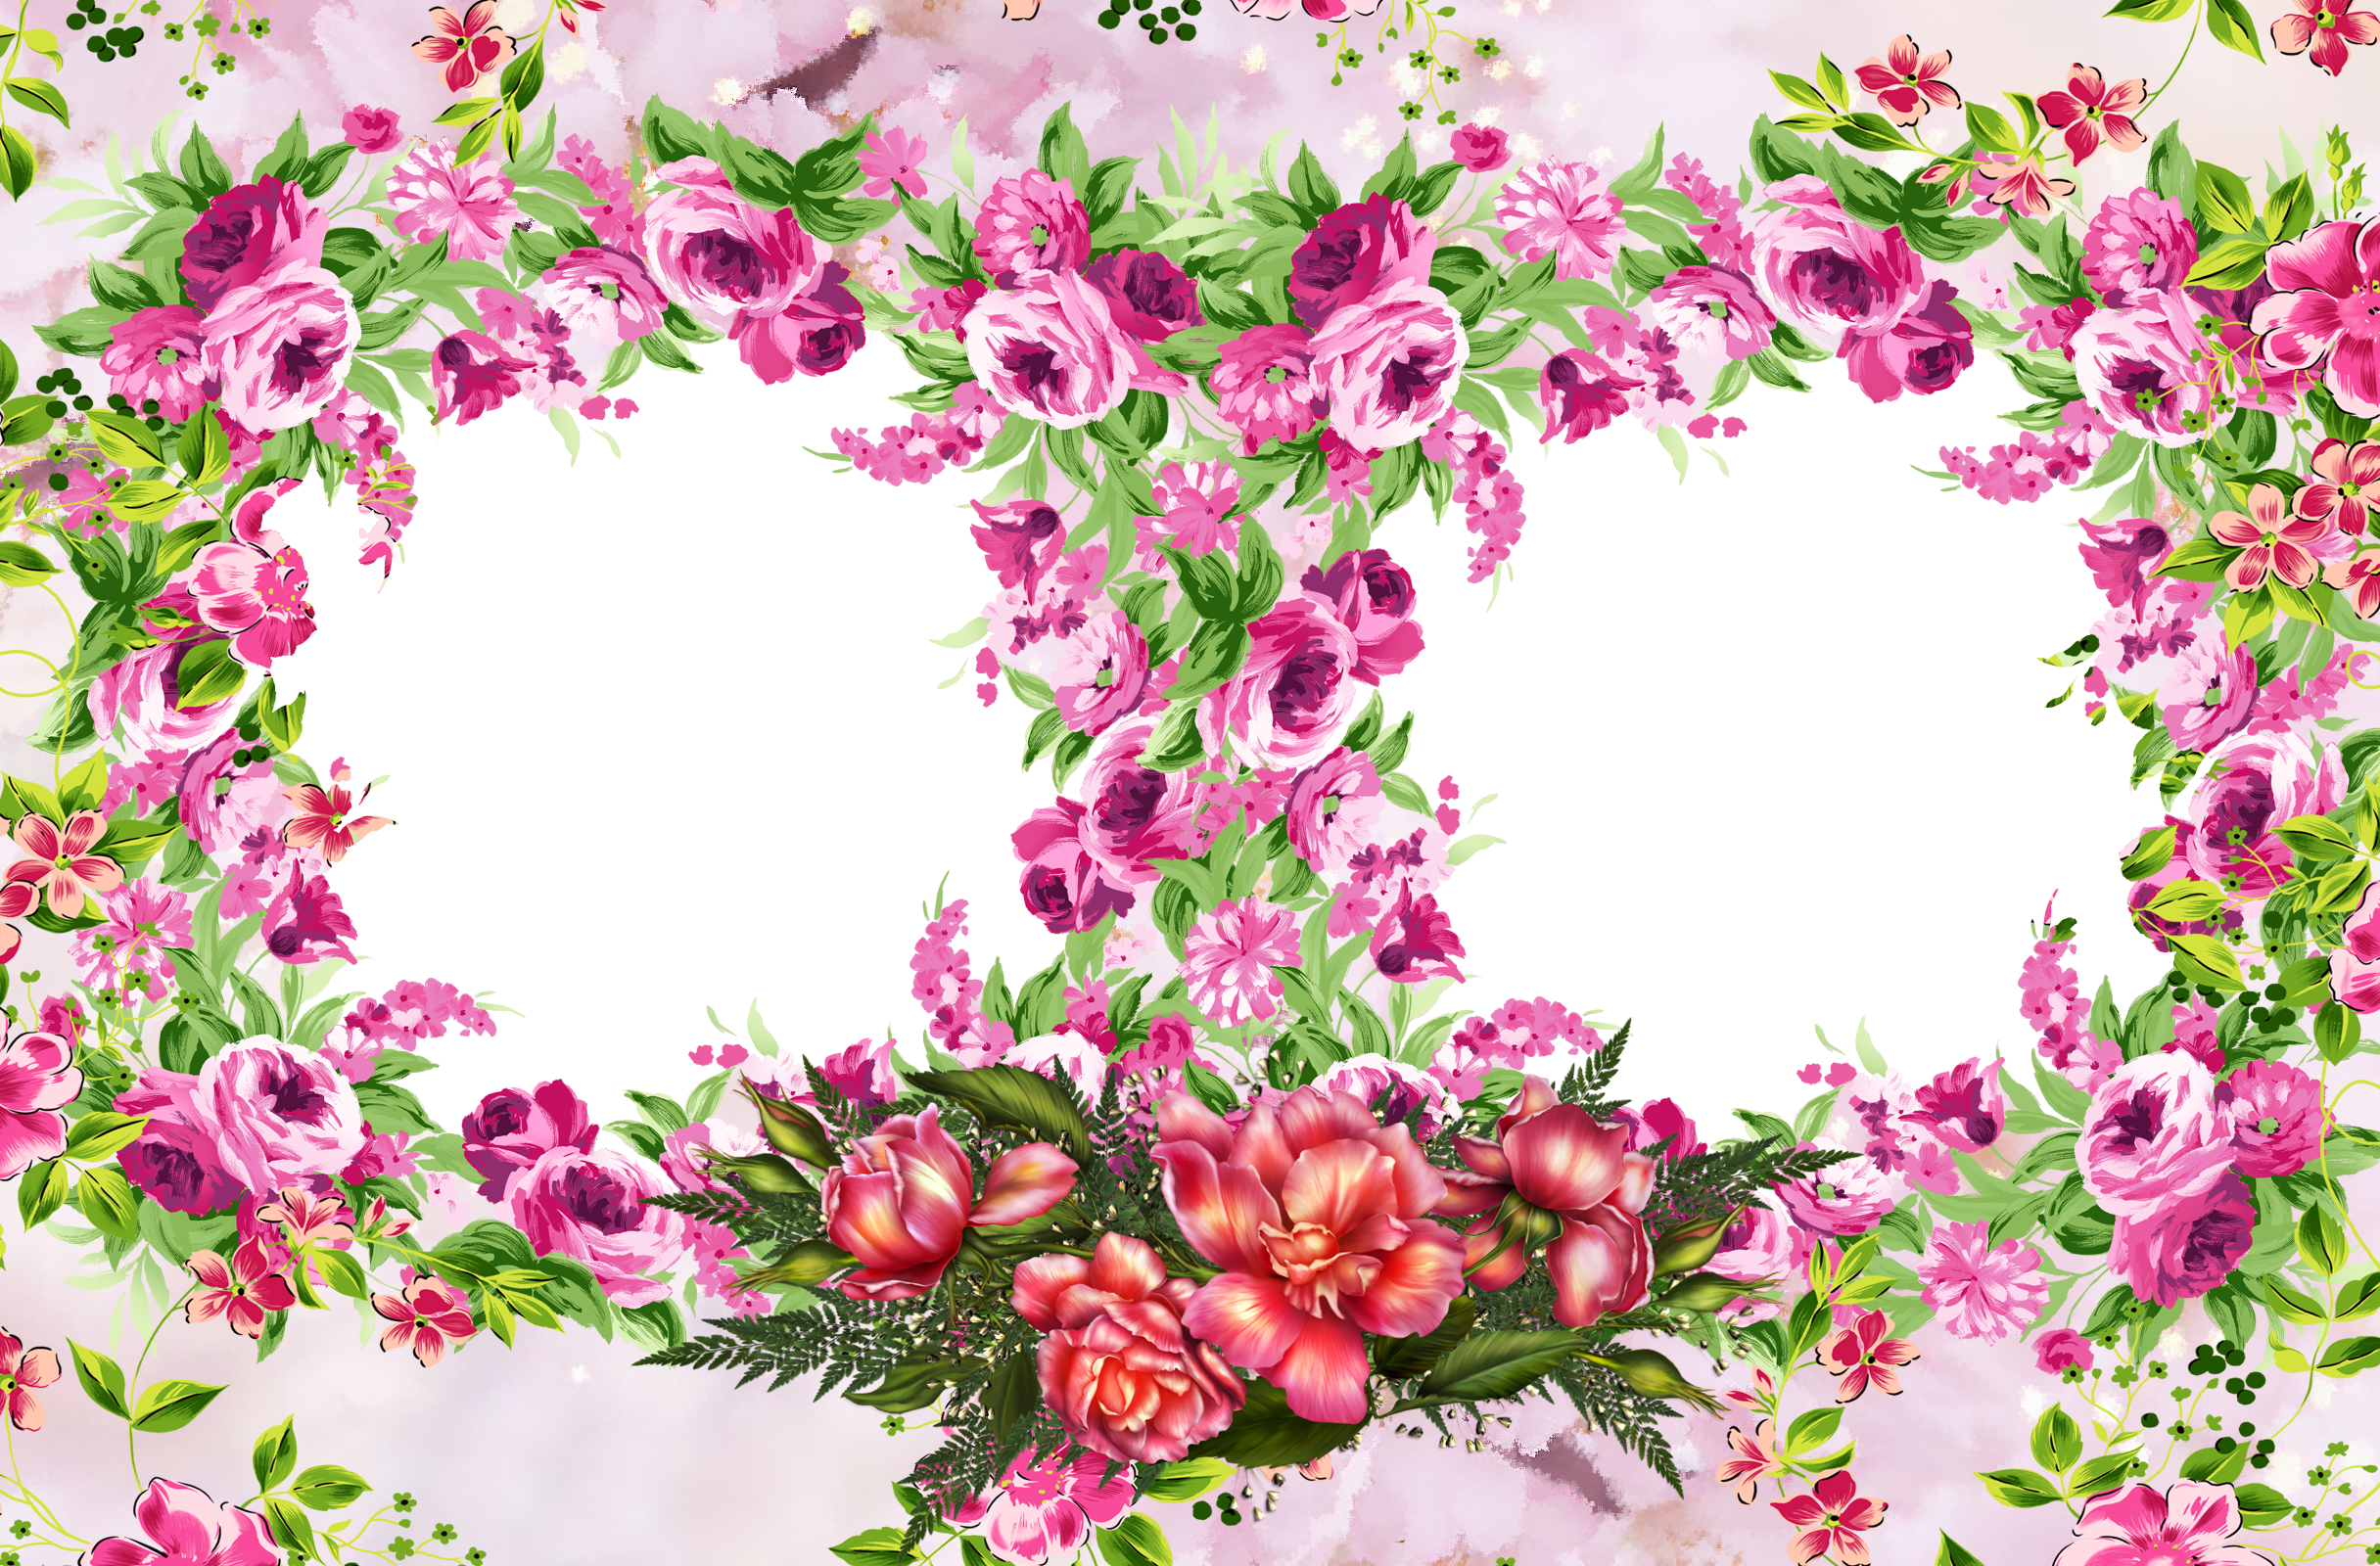 Фон для фото в виде цветов